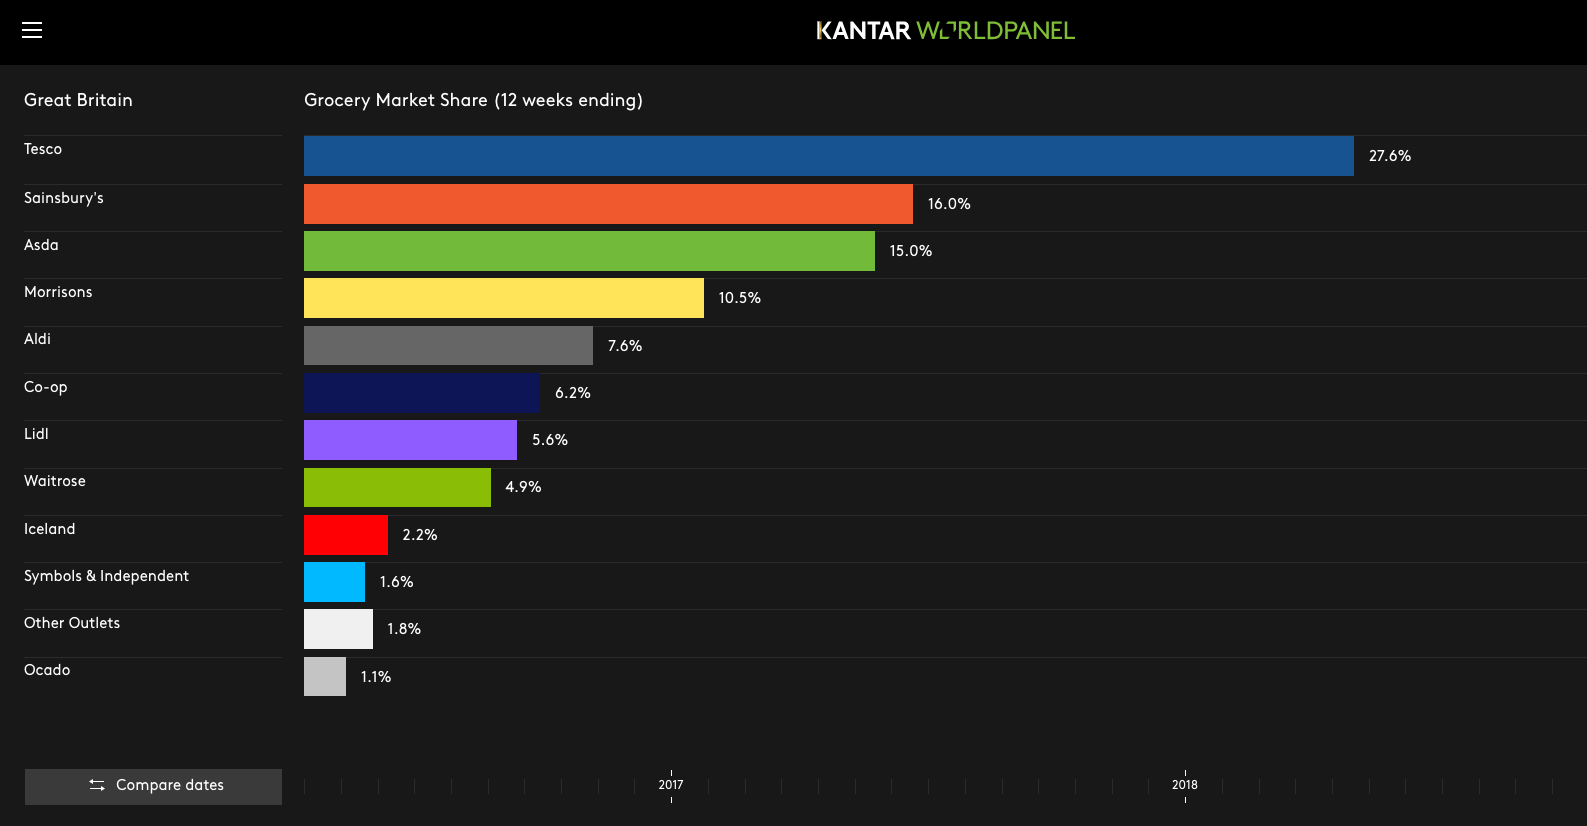 Stats displayed